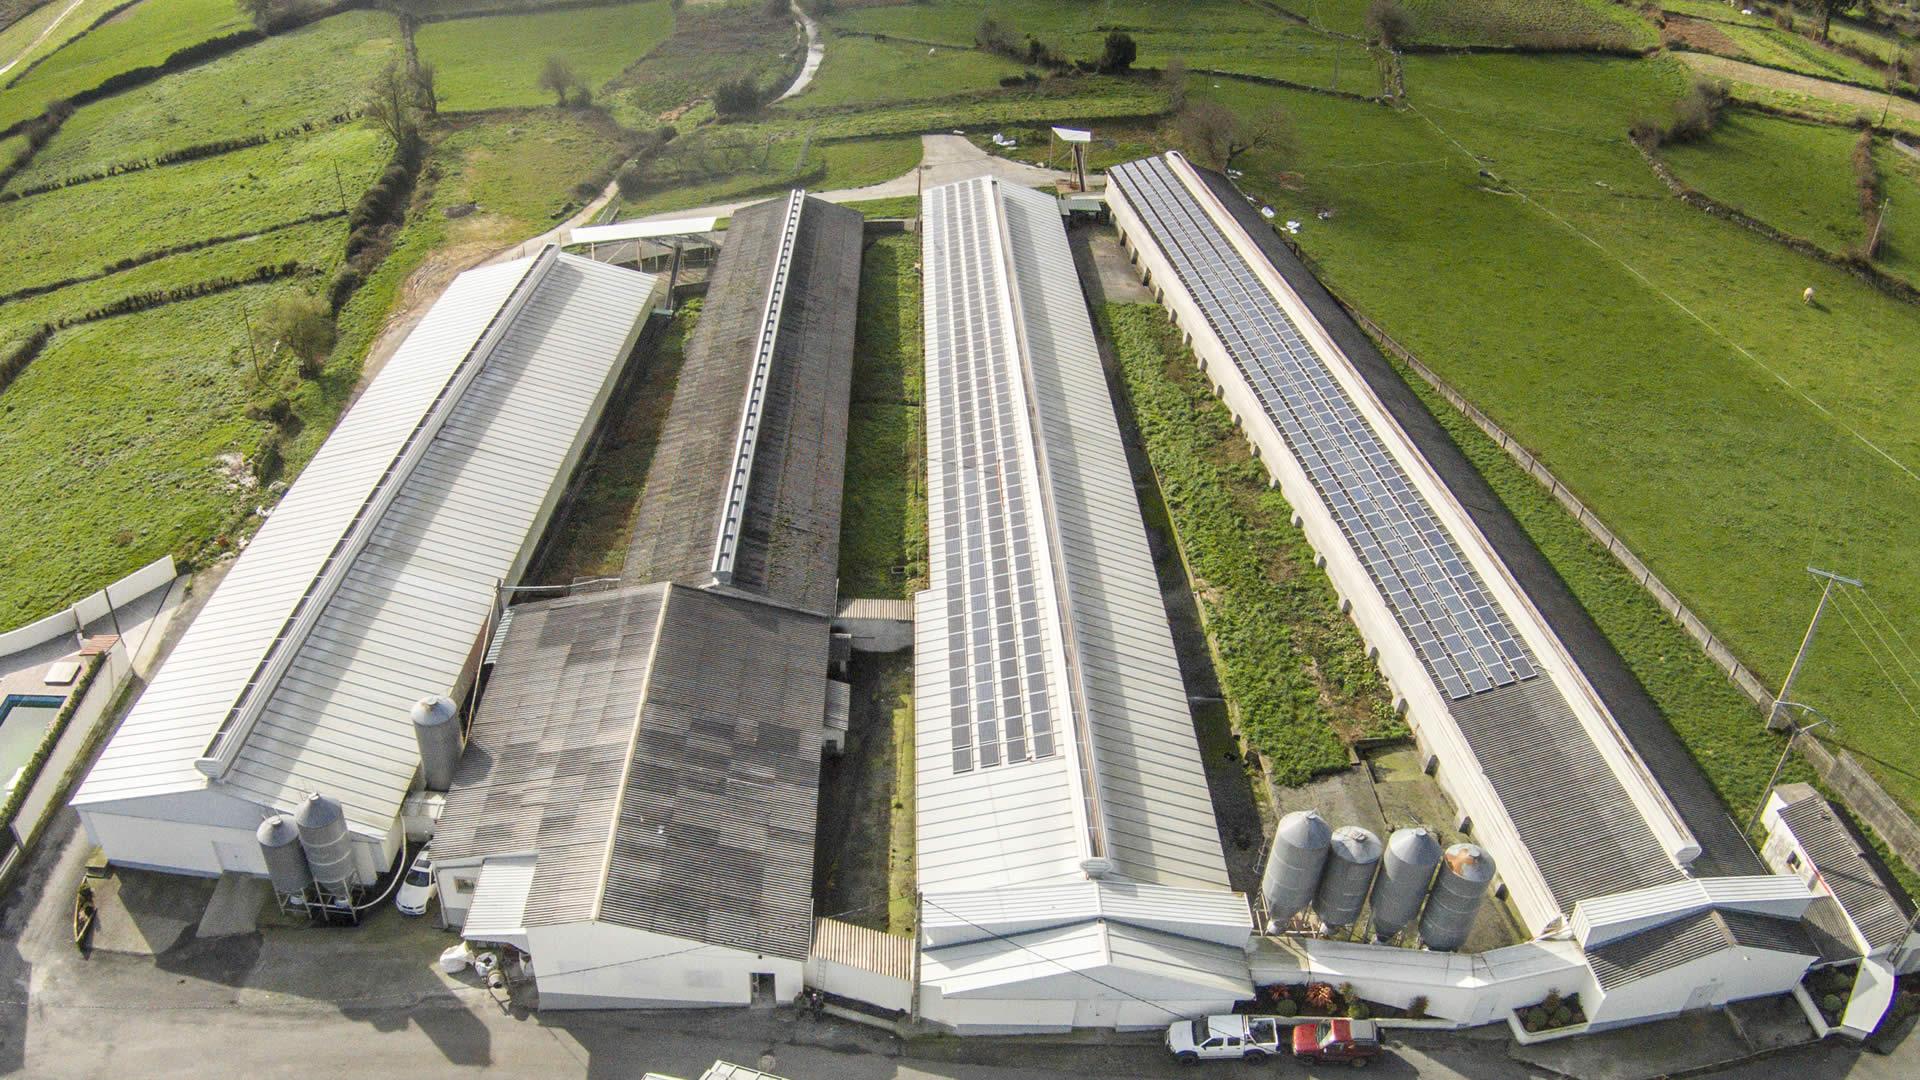 edf-solar-instalacion-paneles-solares-granja-campomayor-4